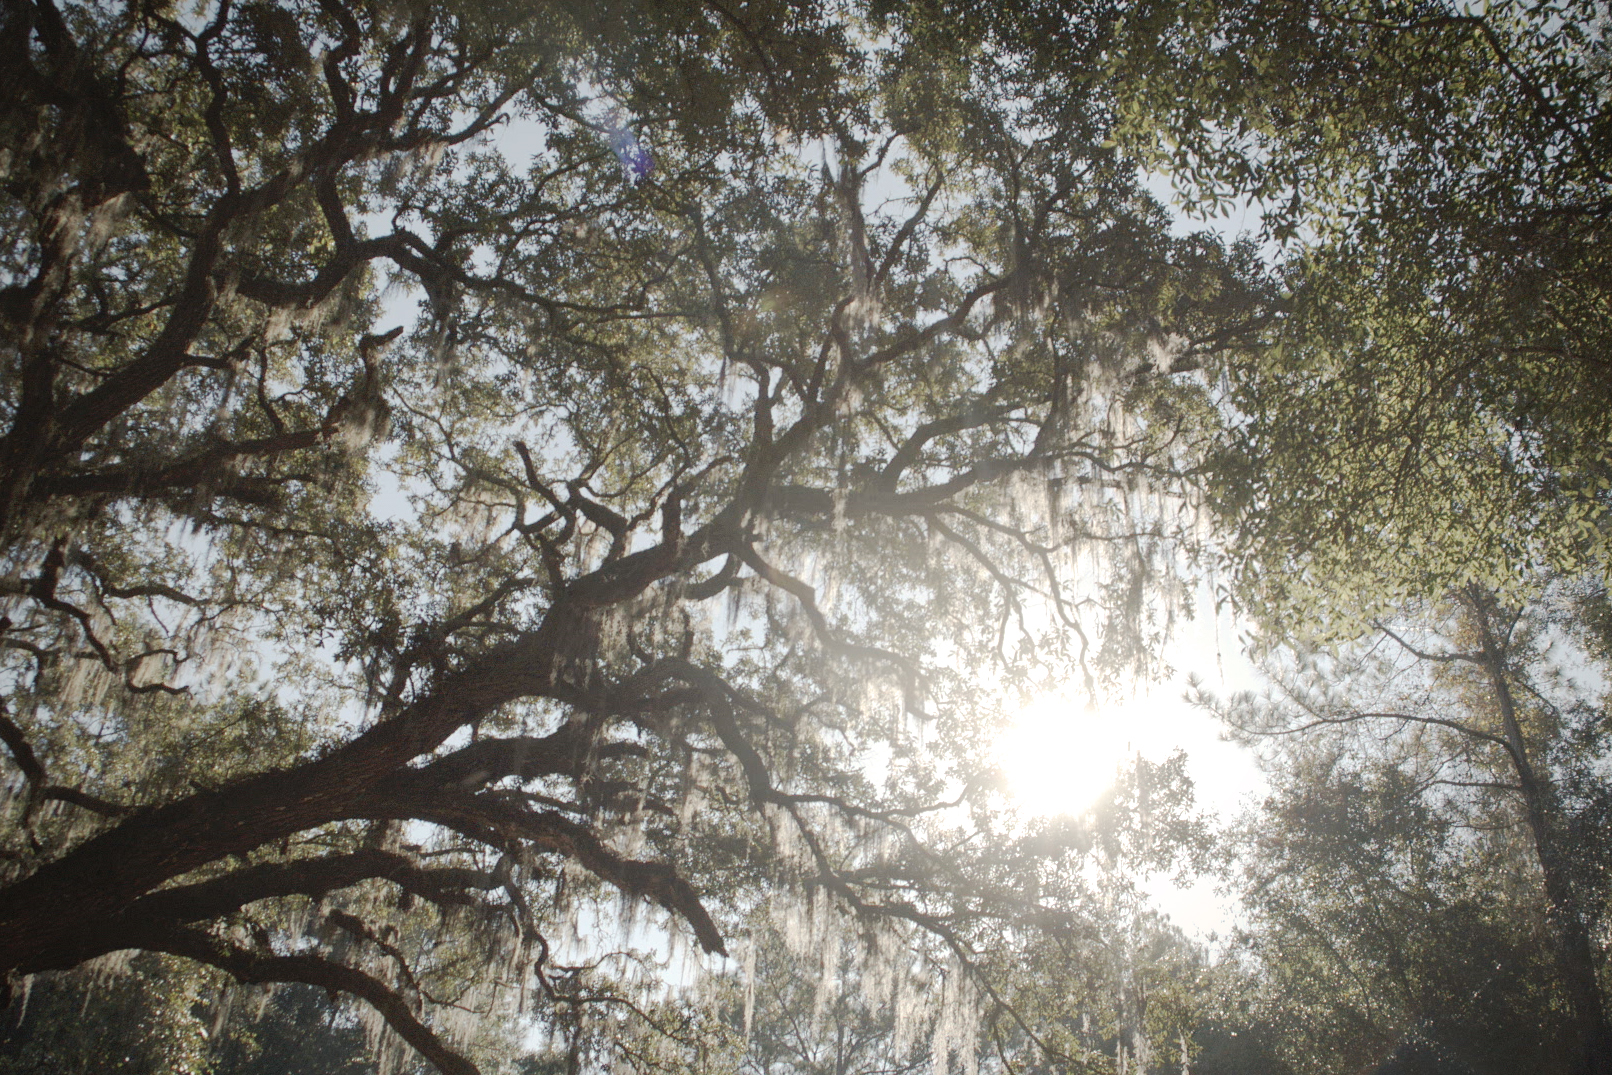 Screen Shot 2014-12-18 at 5.17.25 PM.jpg